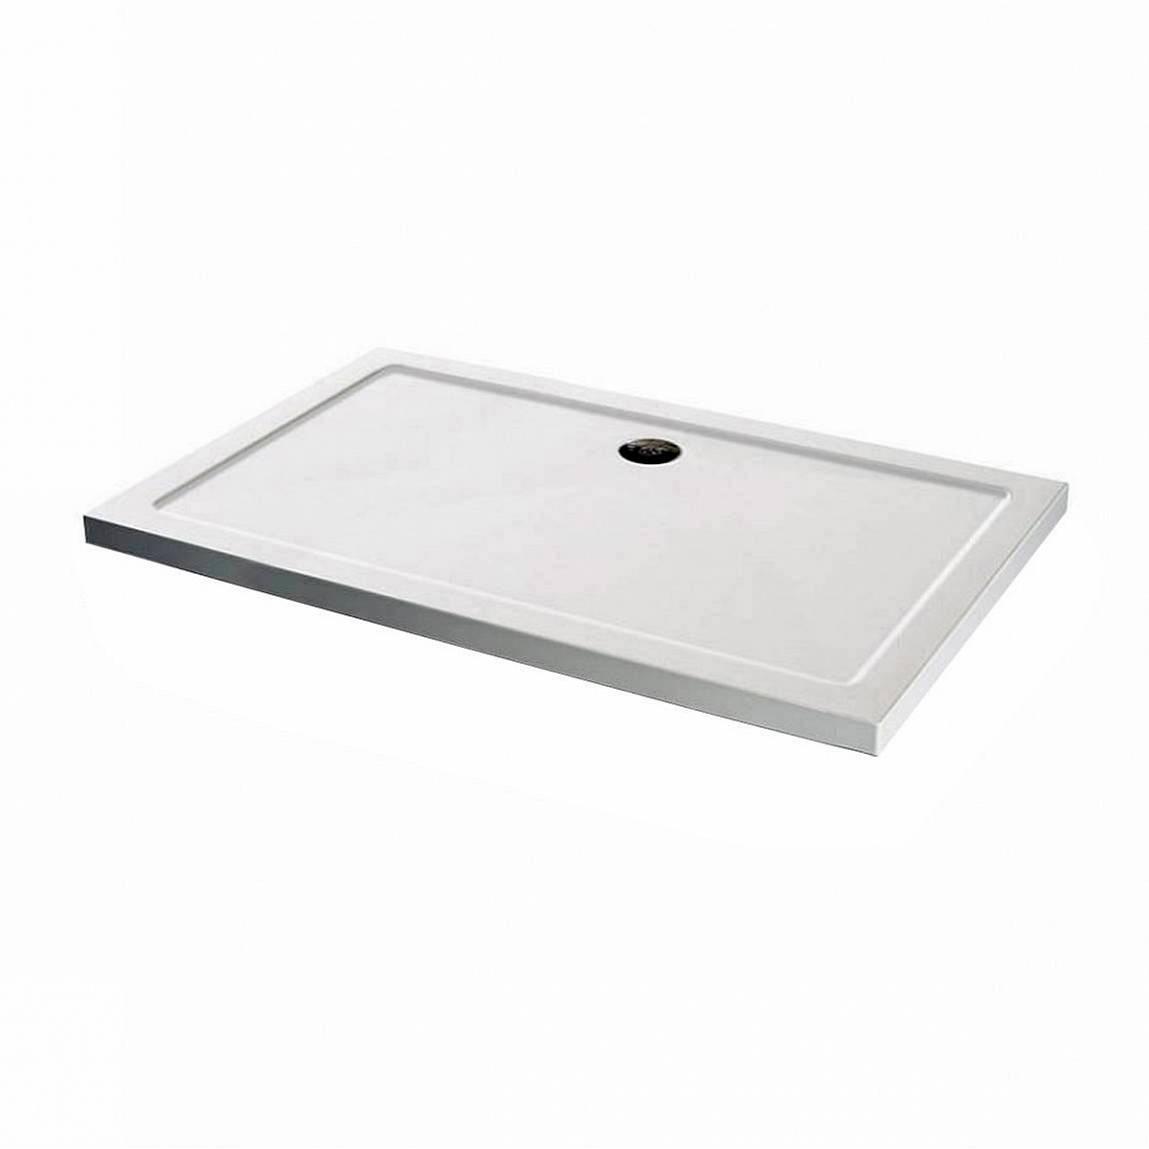 Image of Rectangular Stone Shower Tray 1600 x 800